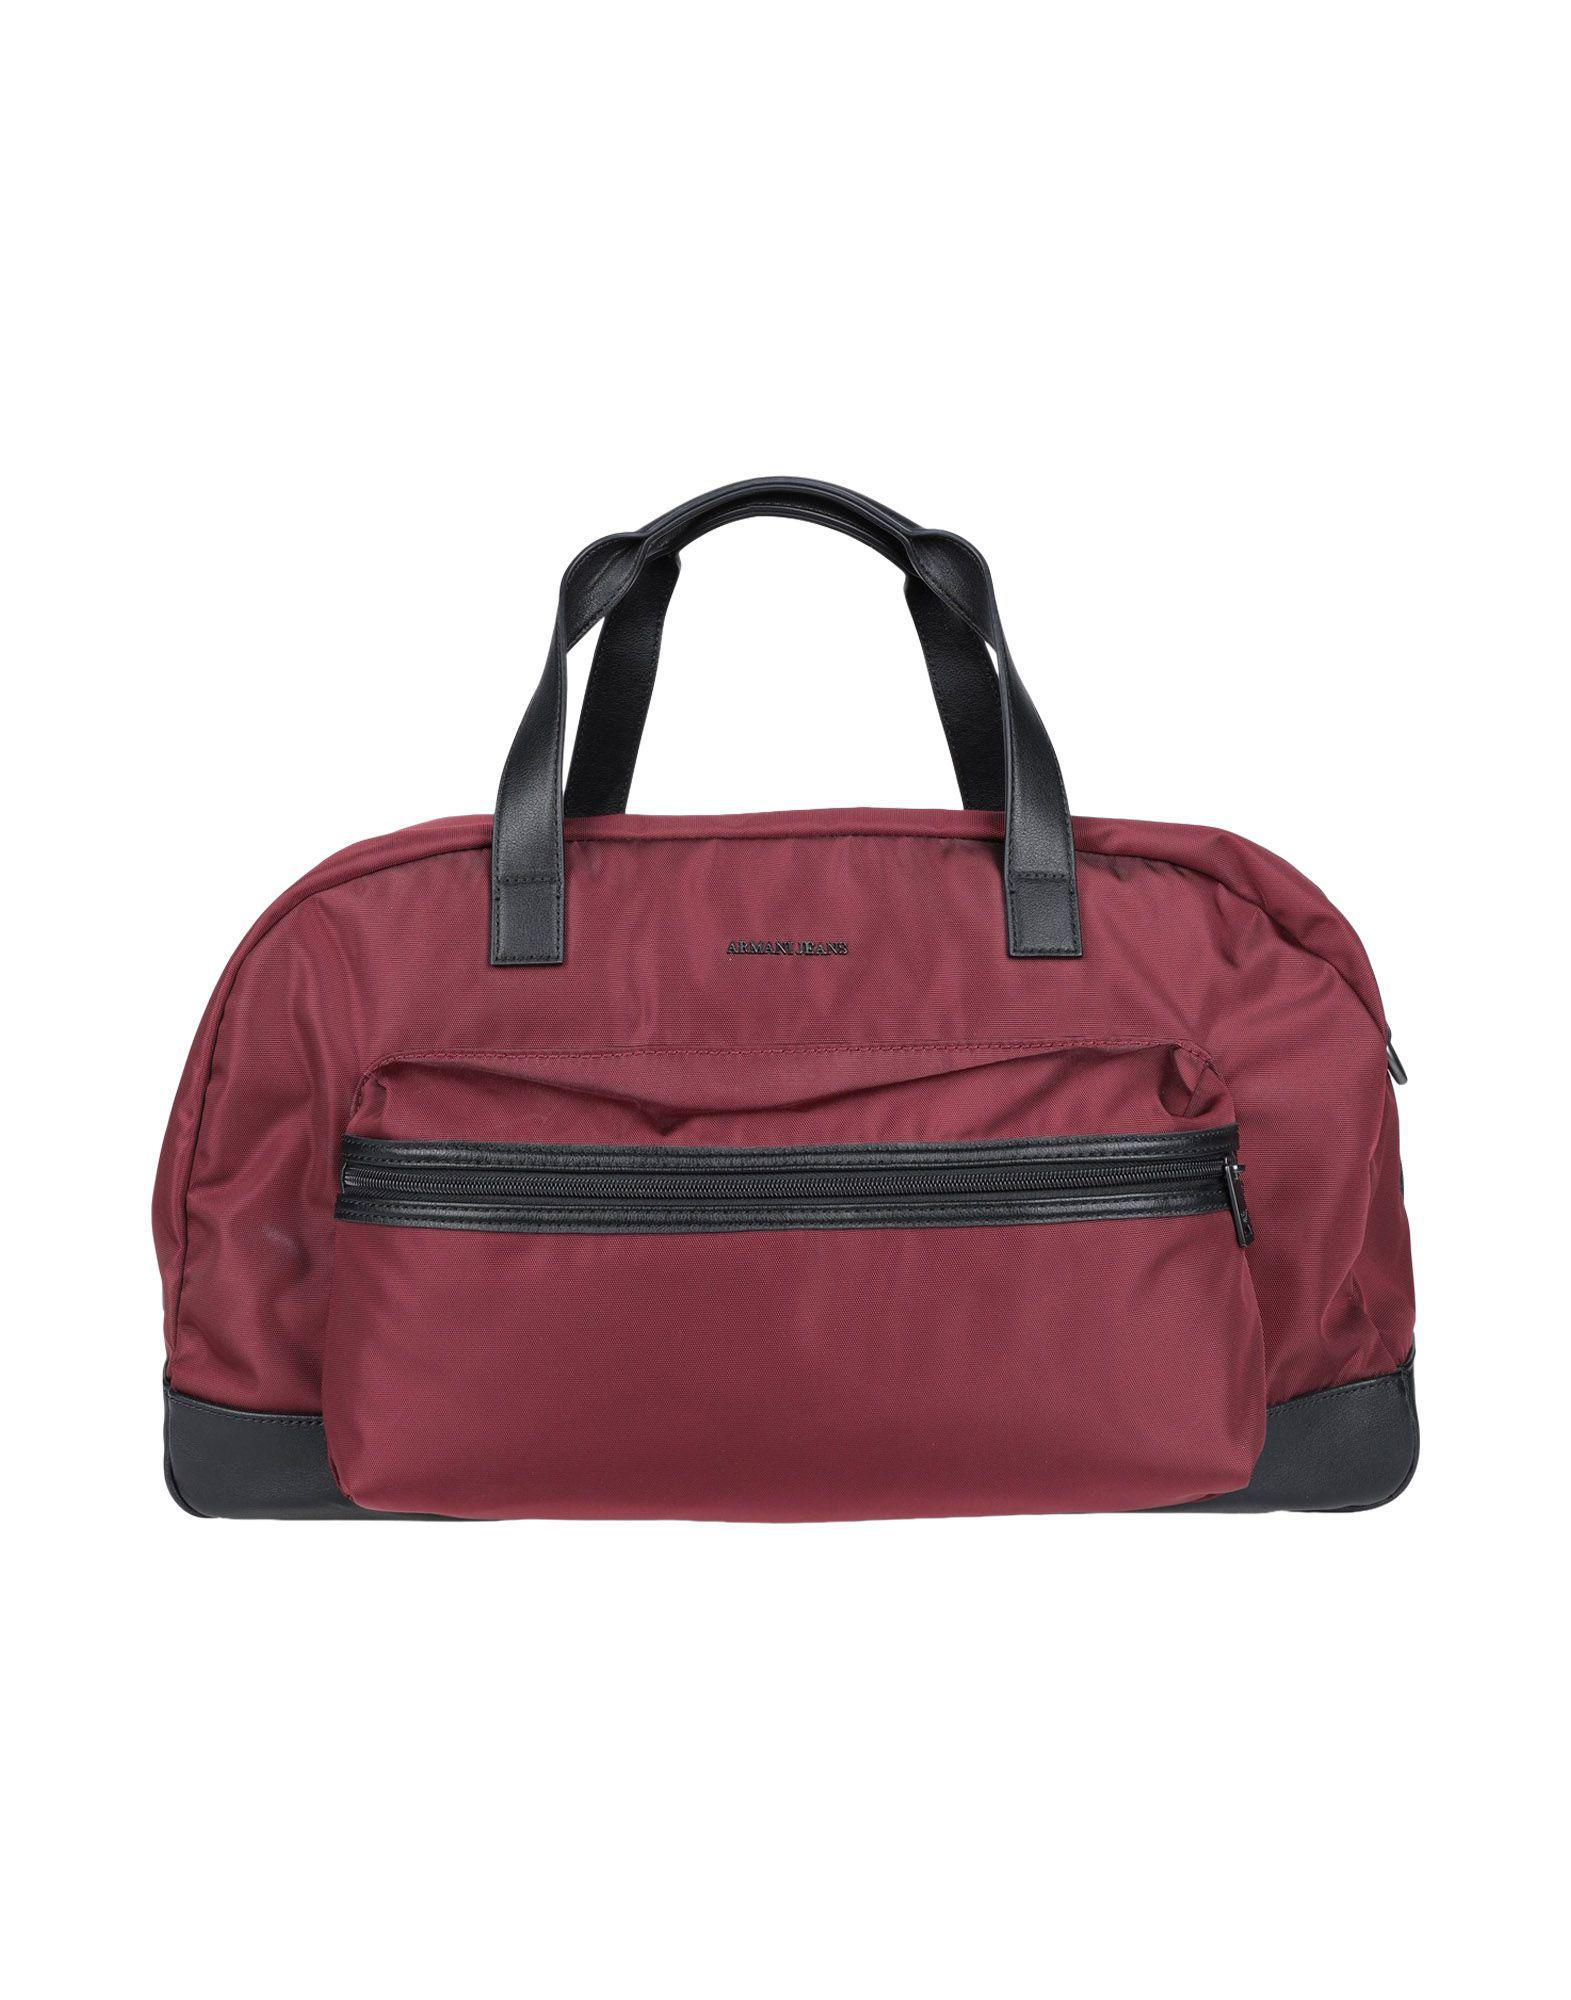 0aea32ca2f76 ... Luggage for Men - Lyst. View fullscreen